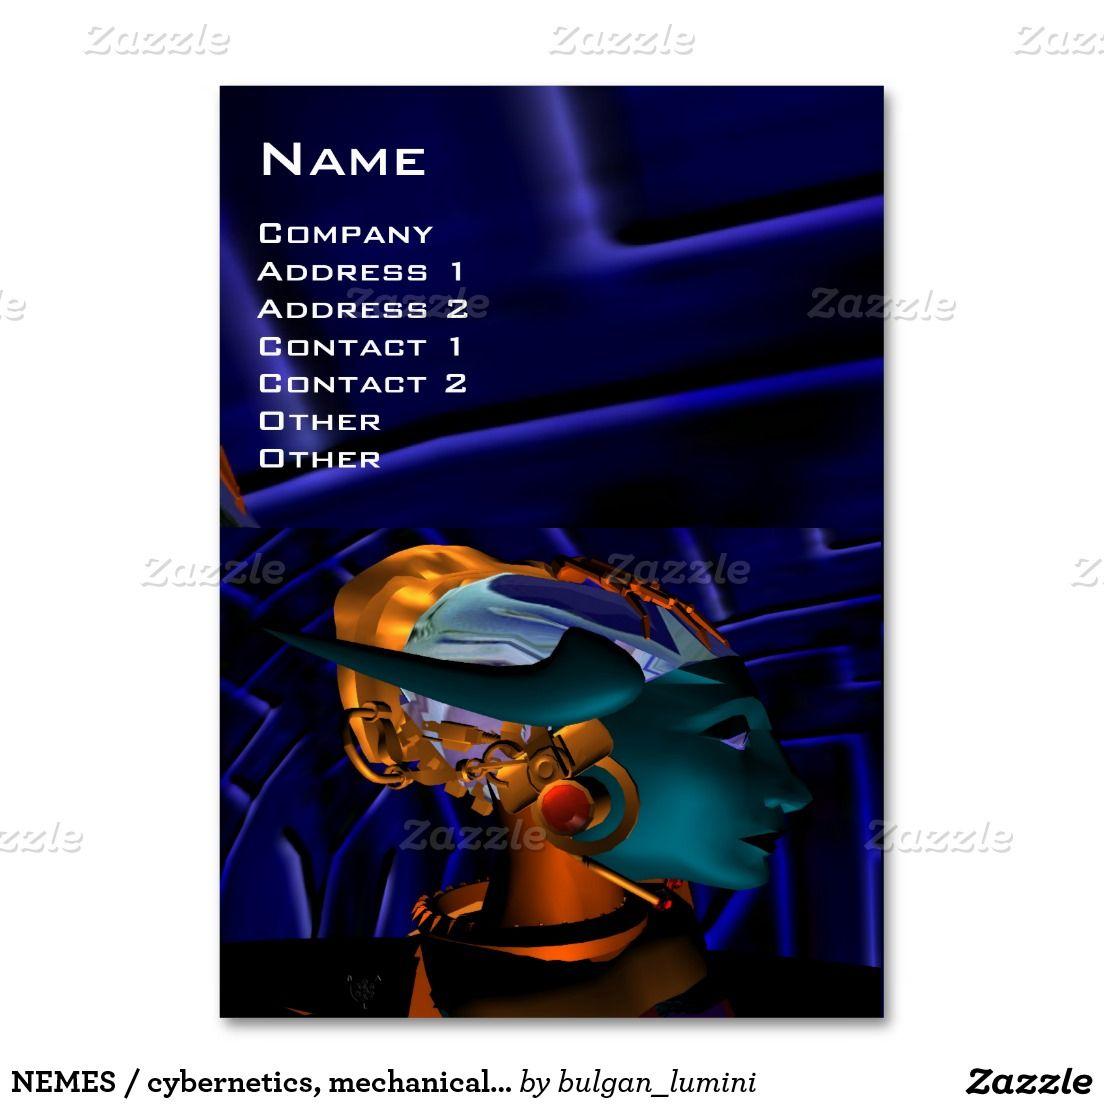 NEMES / cybernetics, mechanical engineer,blue Large Business Card